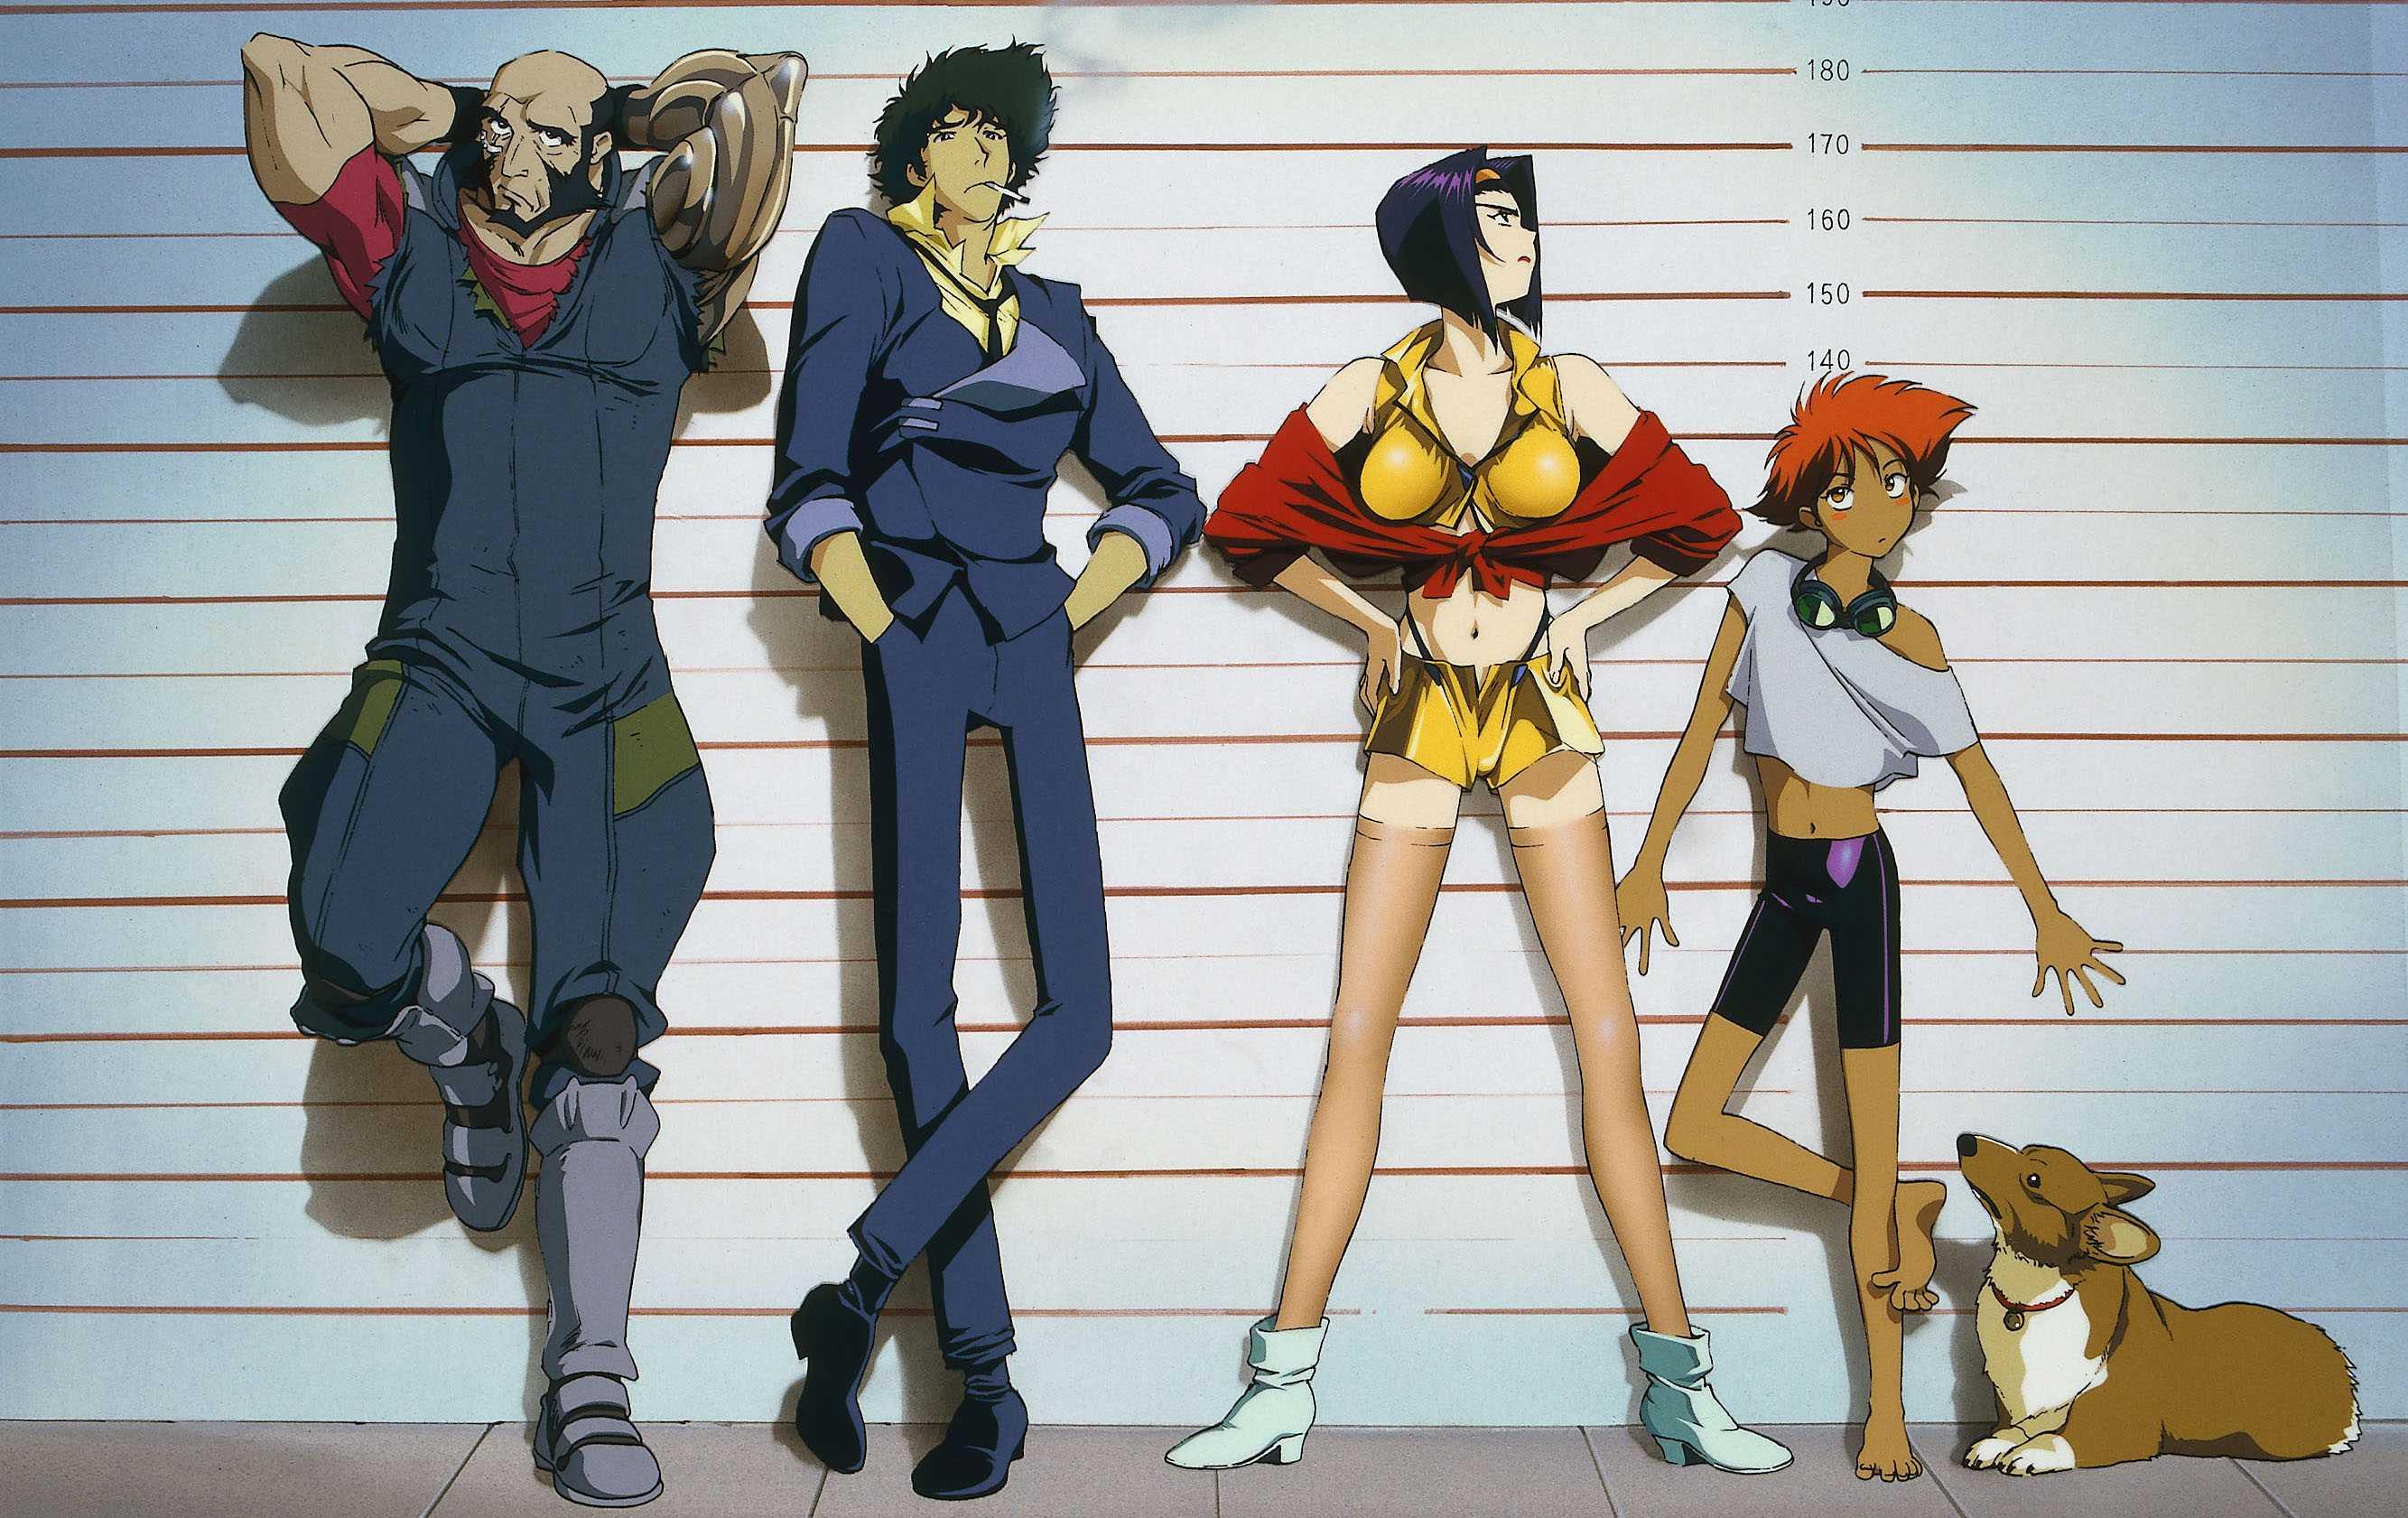 En İyi Anime Film Listesi